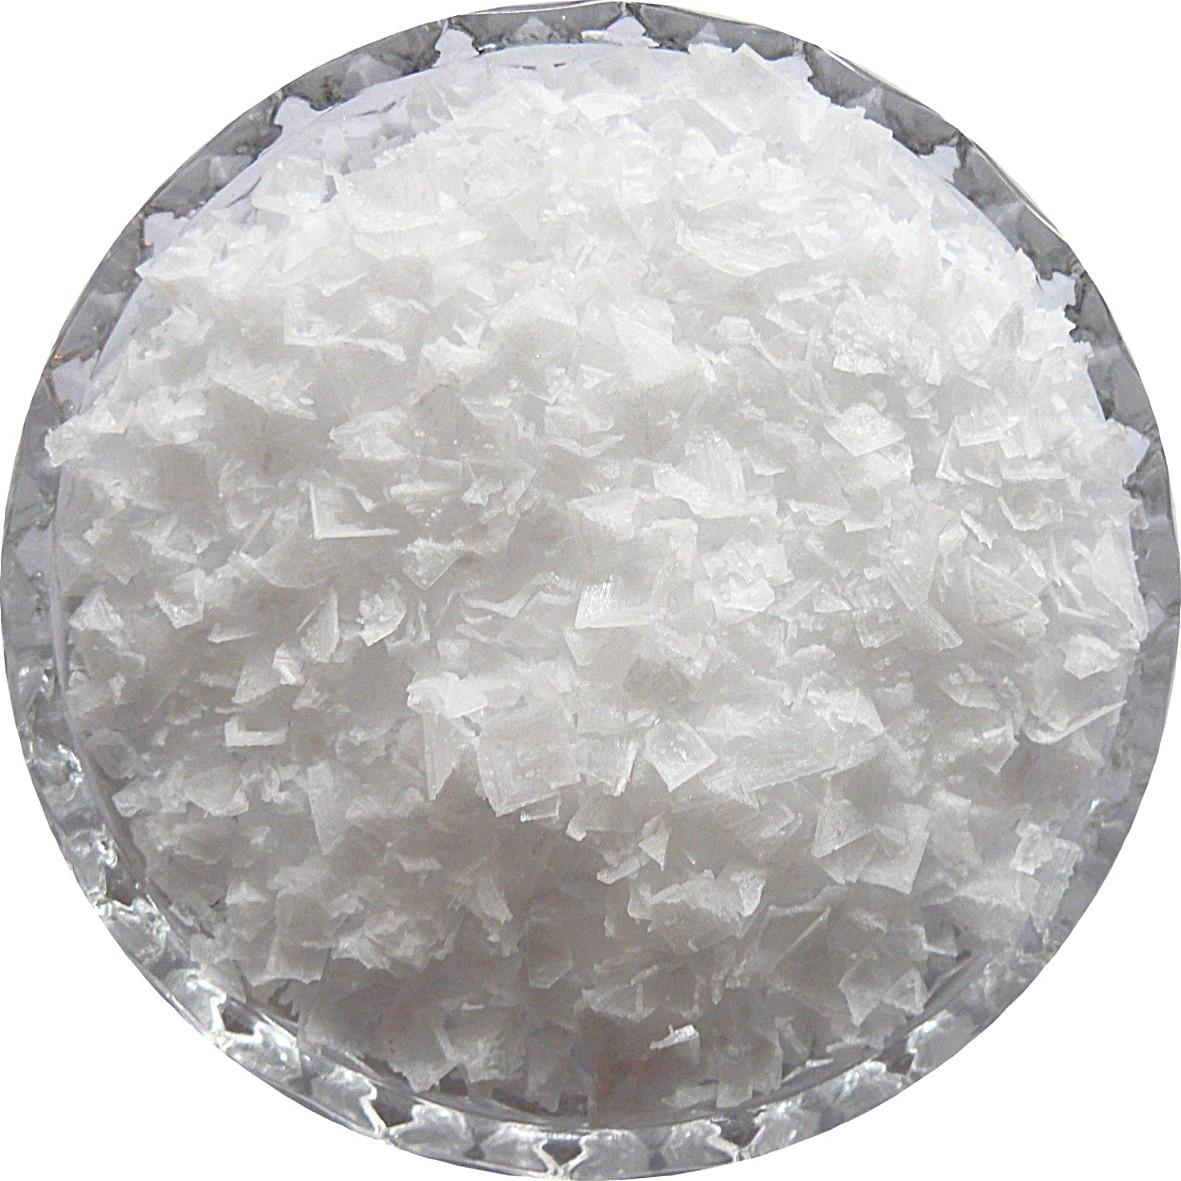 Salzflakes